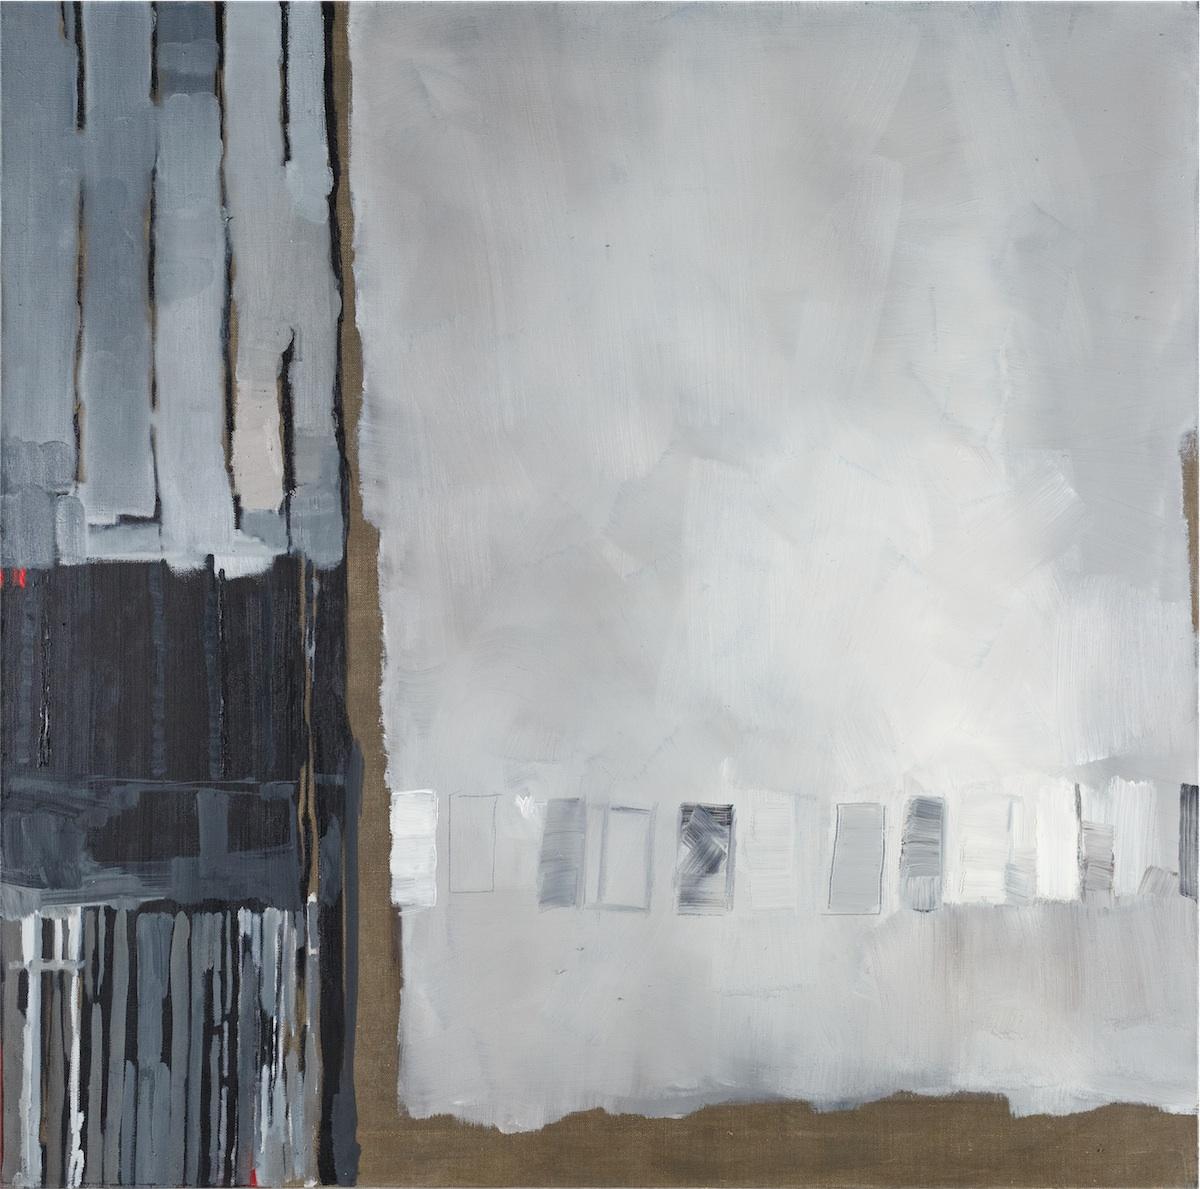 Bez tytułu, 2016